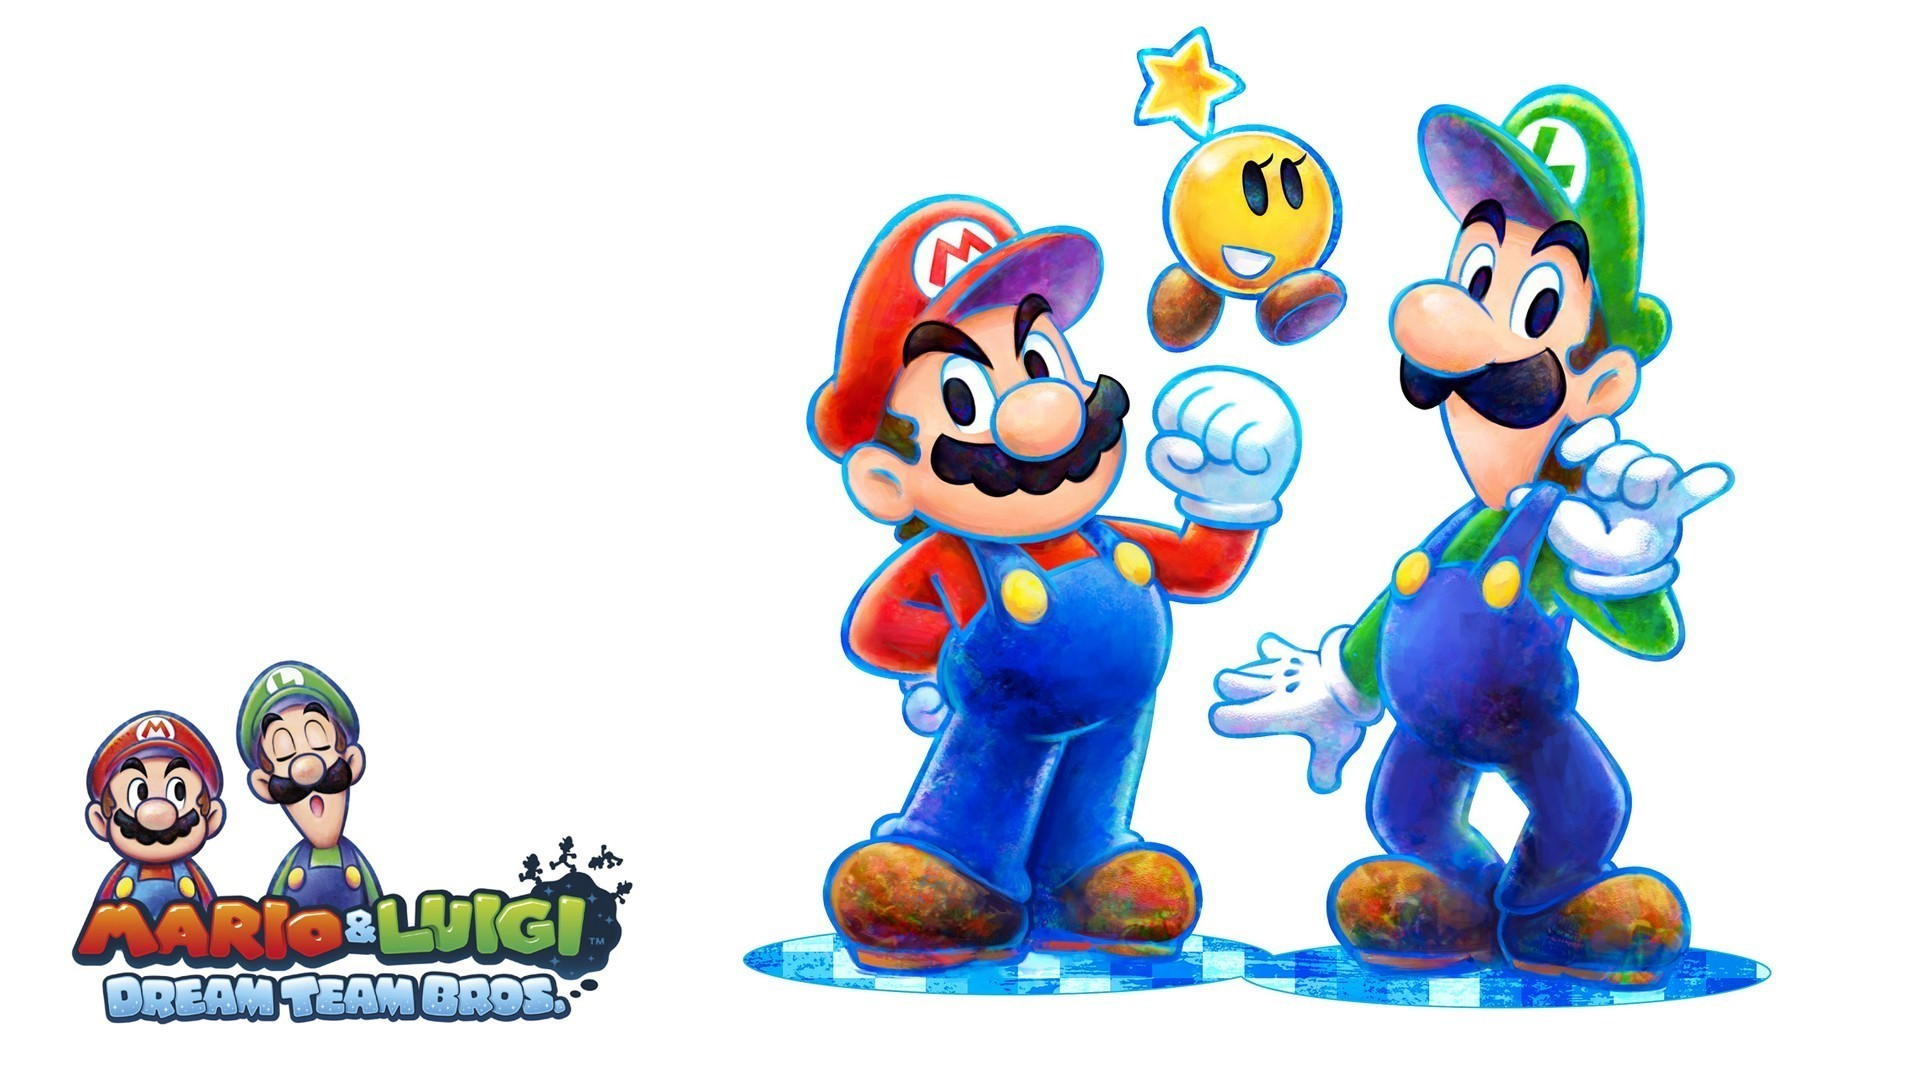 Luigi wallpaper 1920x1080 mario and luigi wallpaper download video games super altavistaventures Gallery